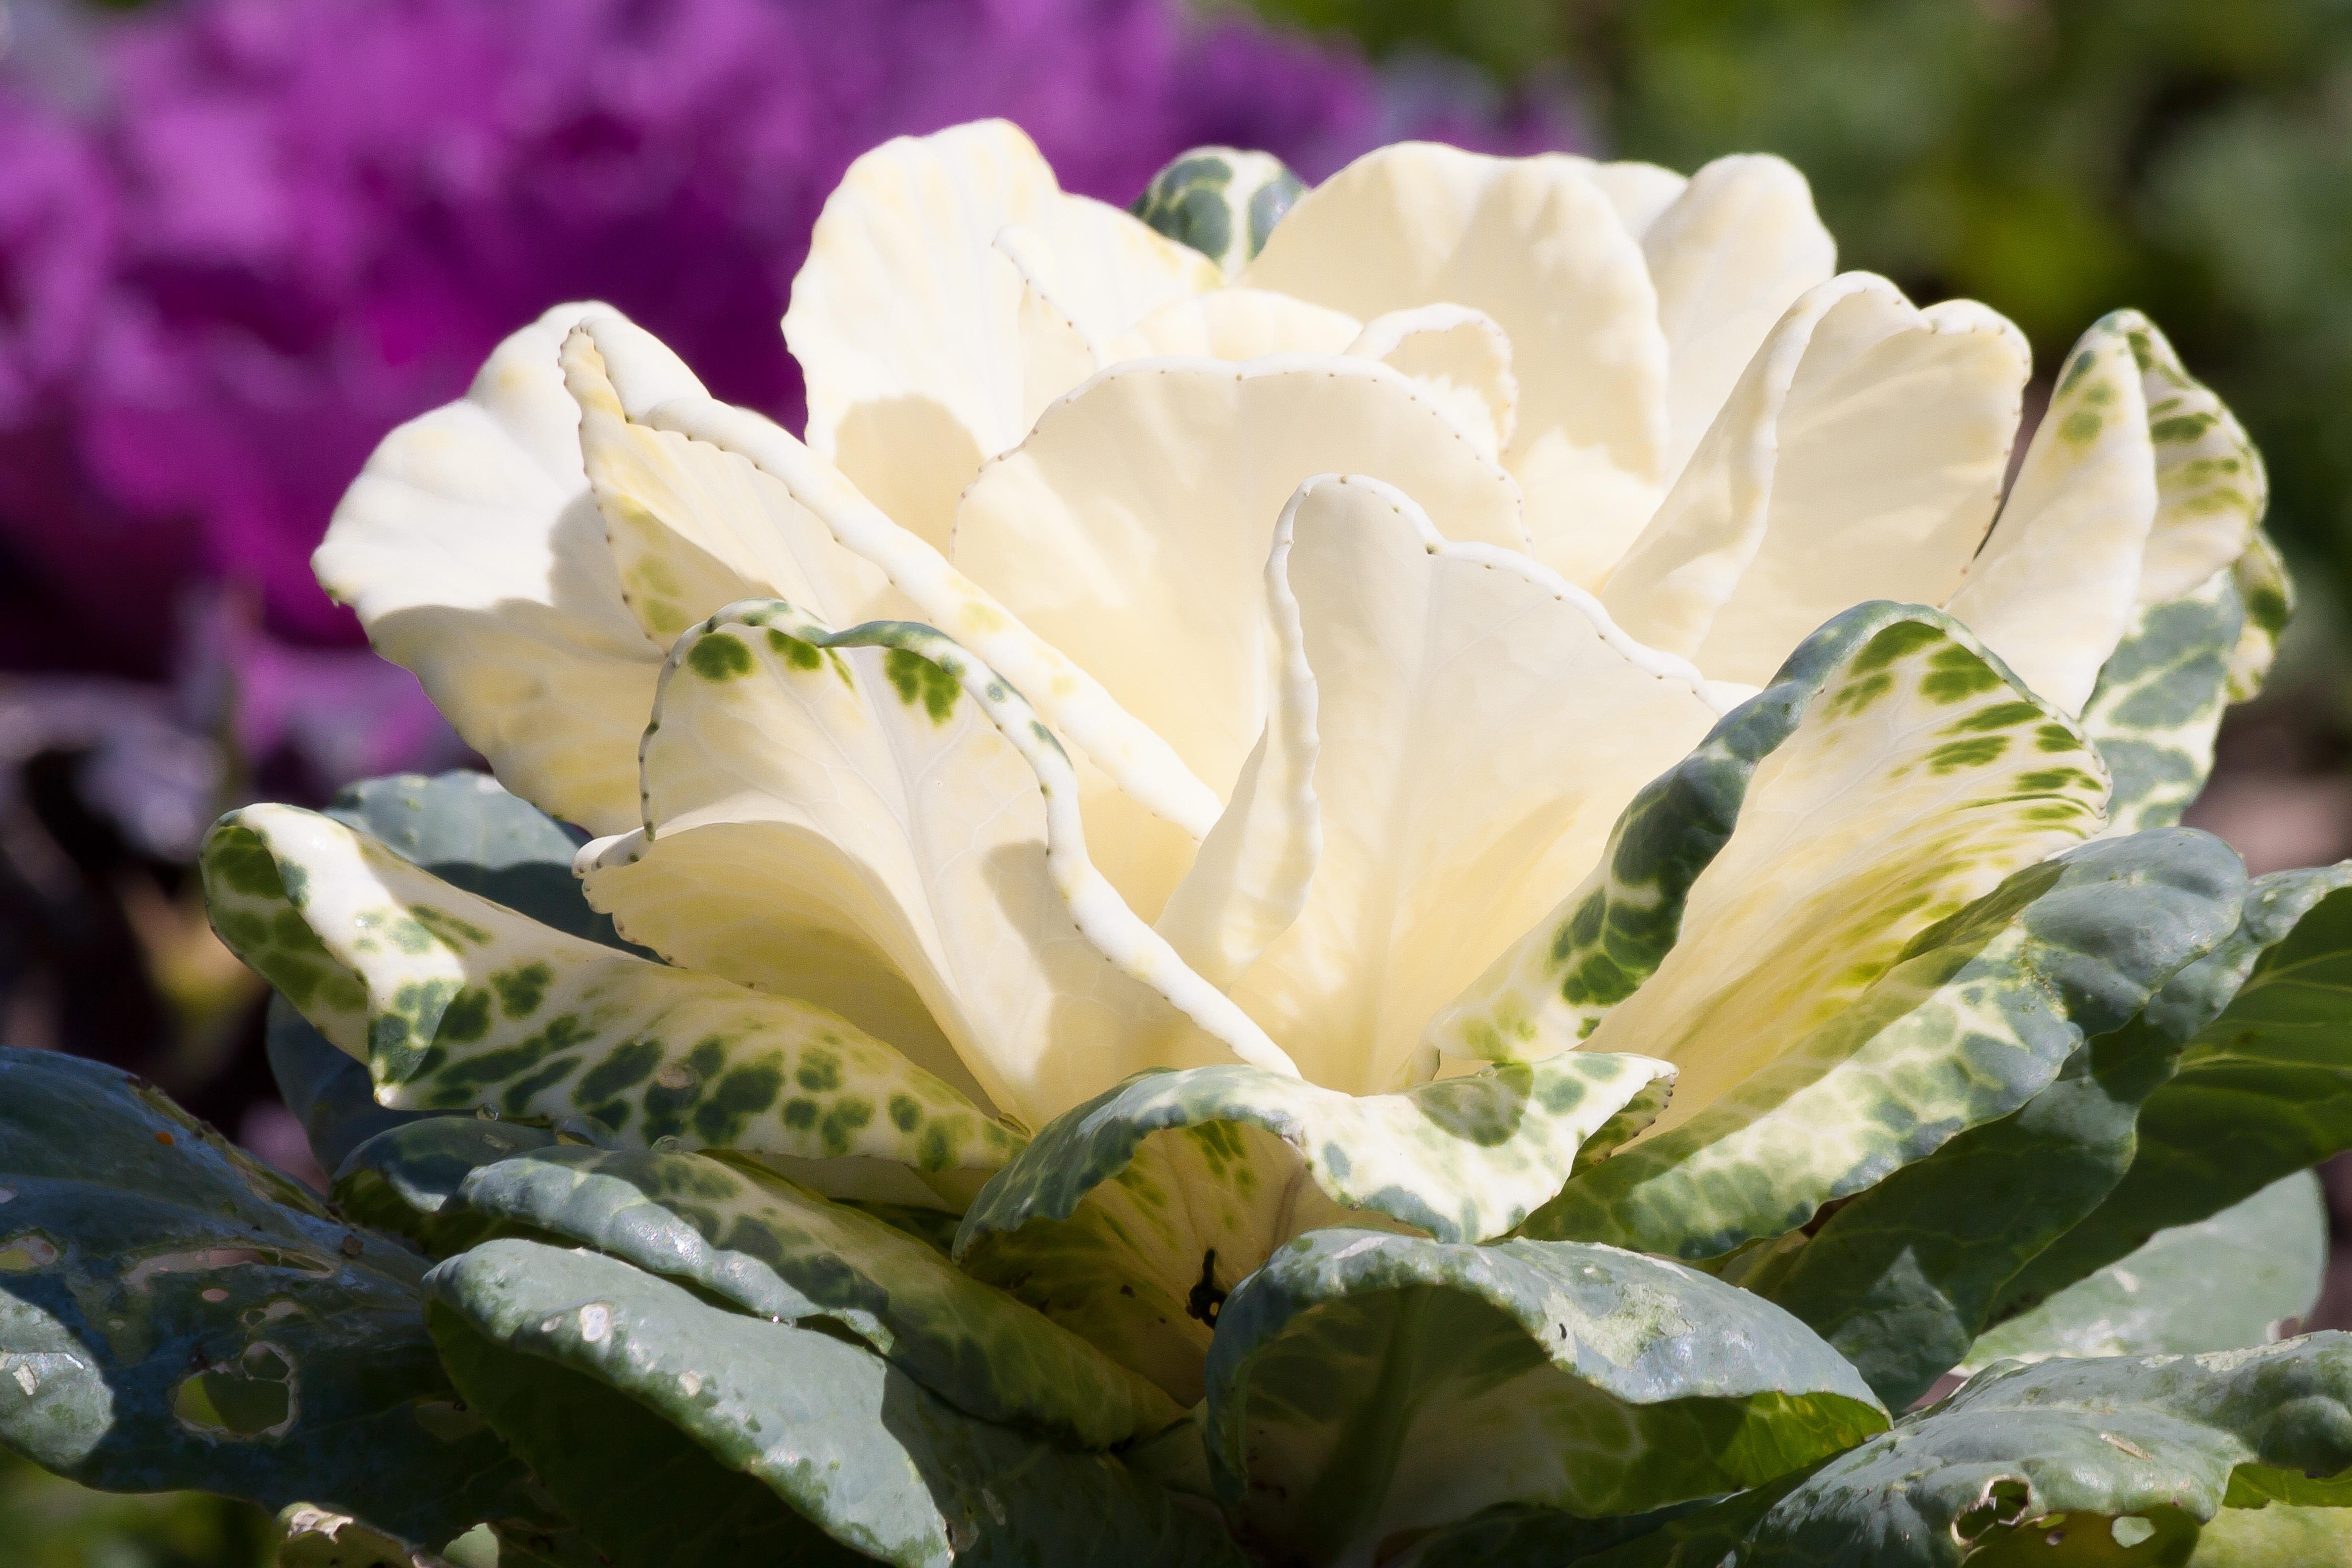 Free Images Nature Blossom White Flower Petal Food Botany